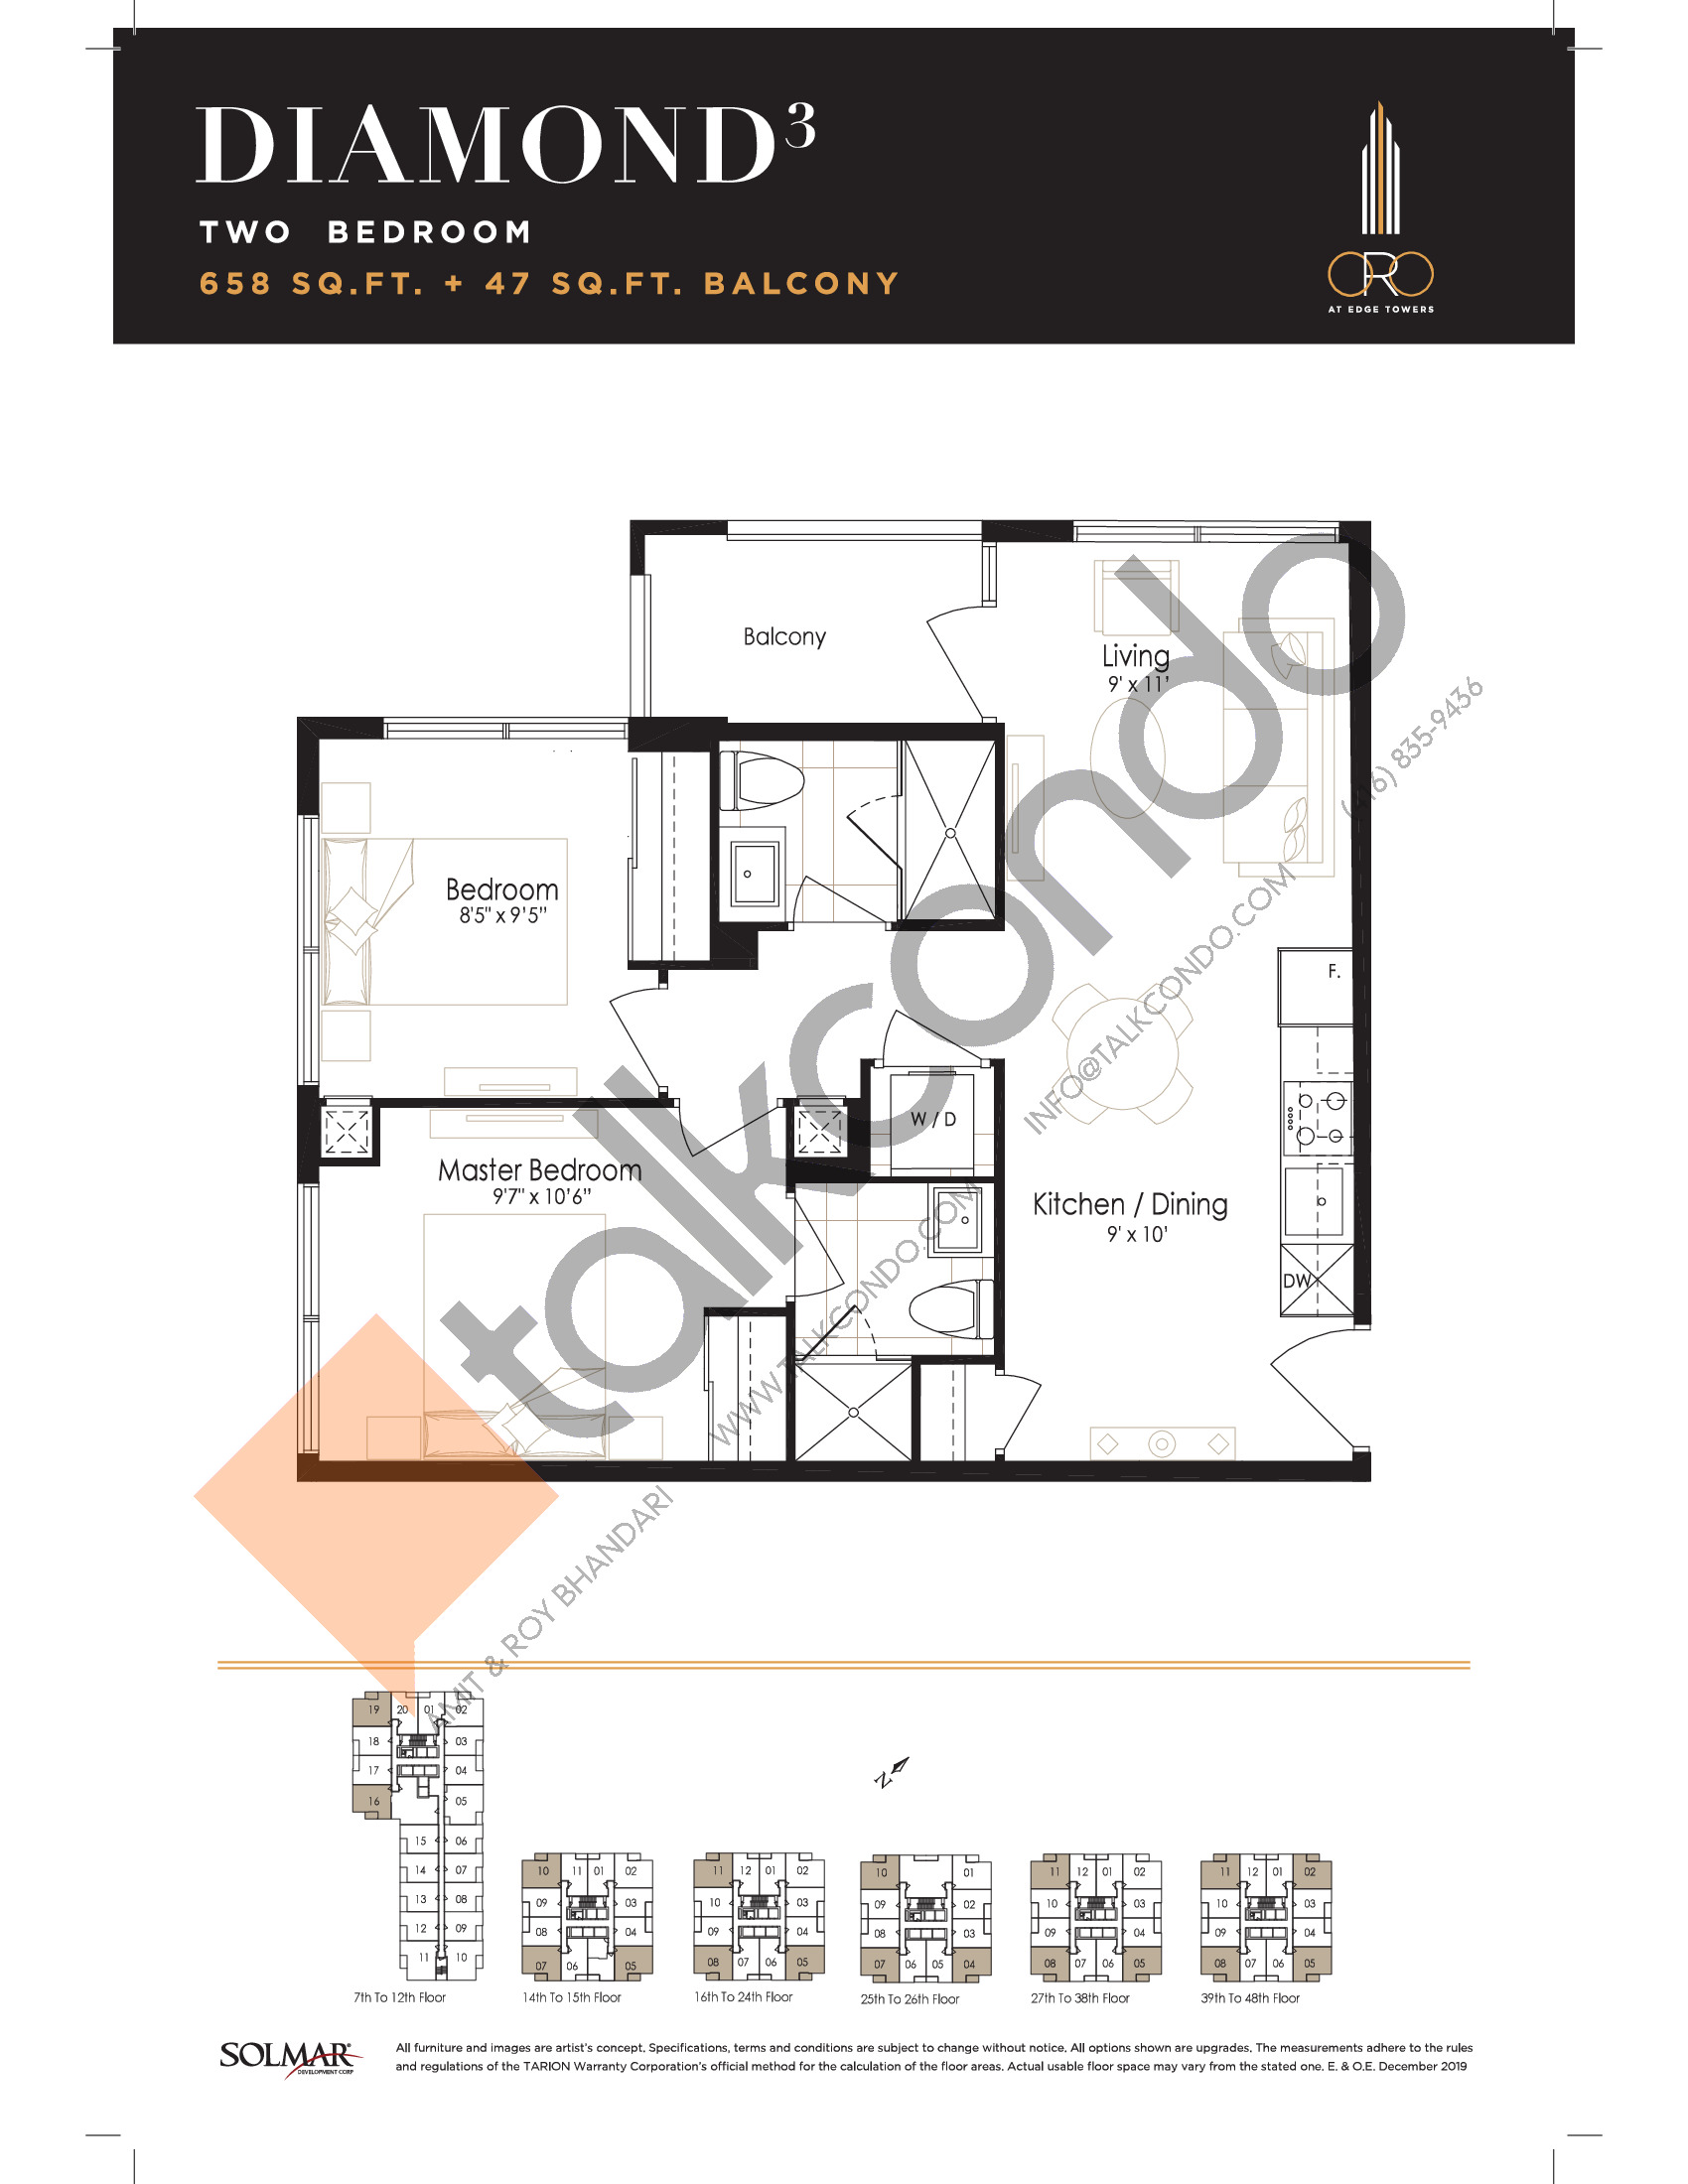 Diamond Floor Plan at ORO at Edge Towers Condos - 658 sq.ft